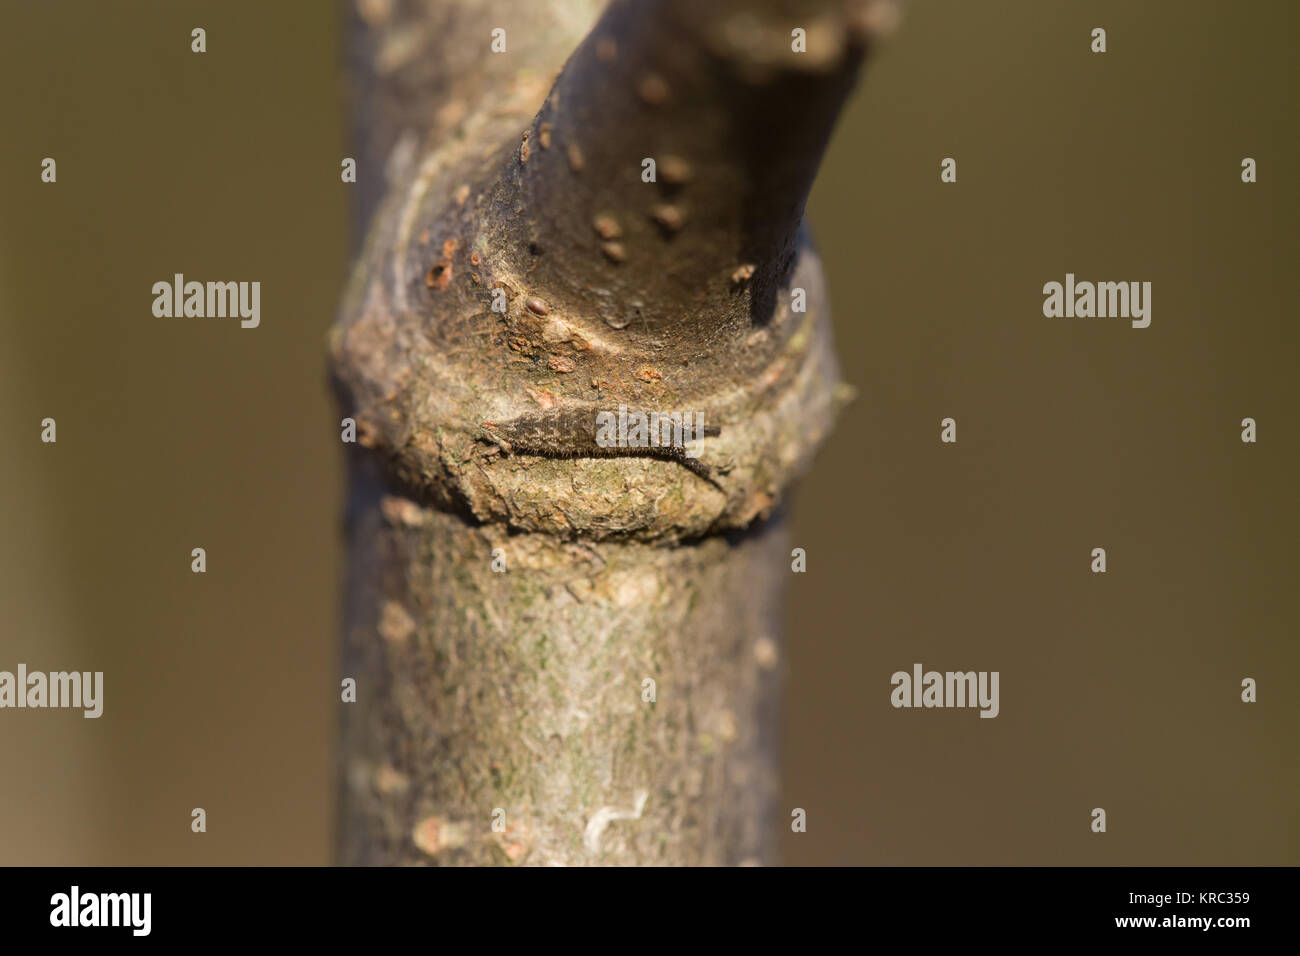 Hibernating lesser purple emperor larva - Stock Image